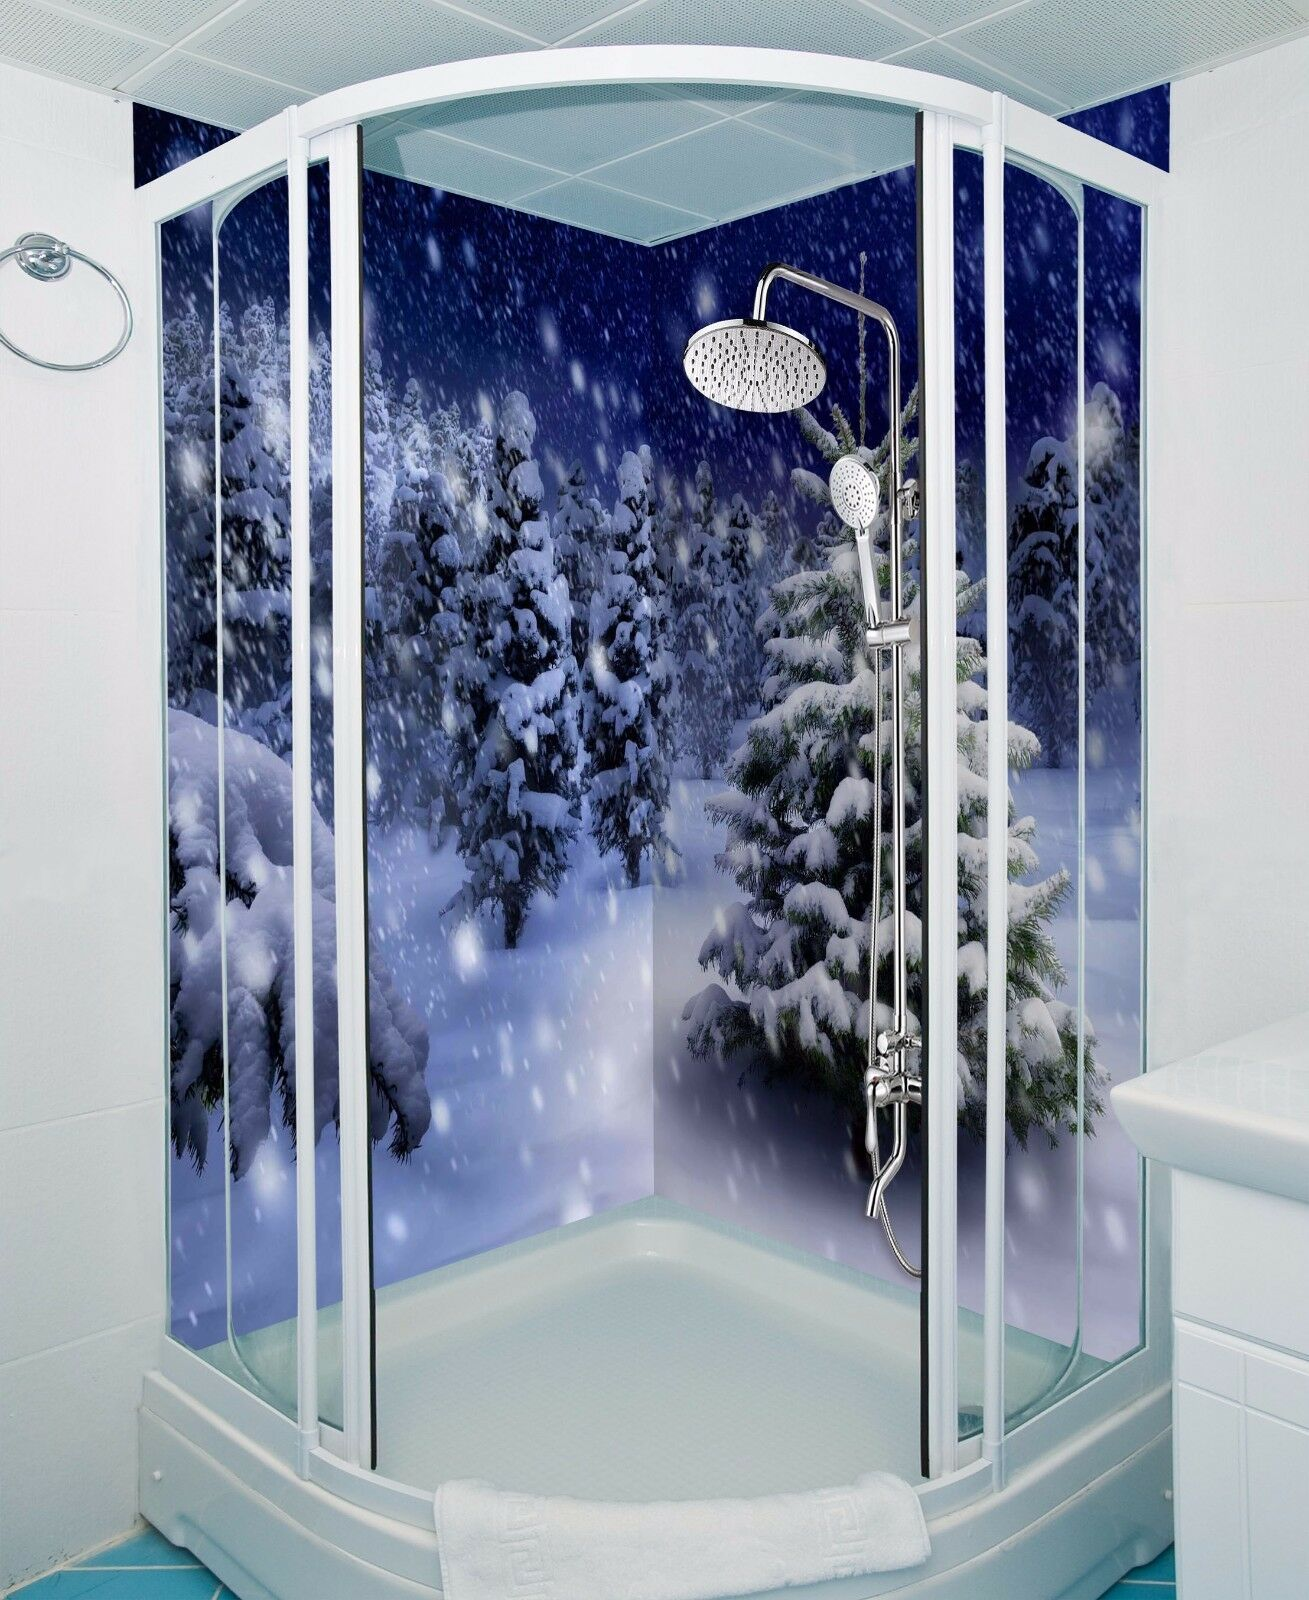 3D Snowing Pine White WallPaper Bathroom Print Decal Wall Deco AJ WALLPAPER UK